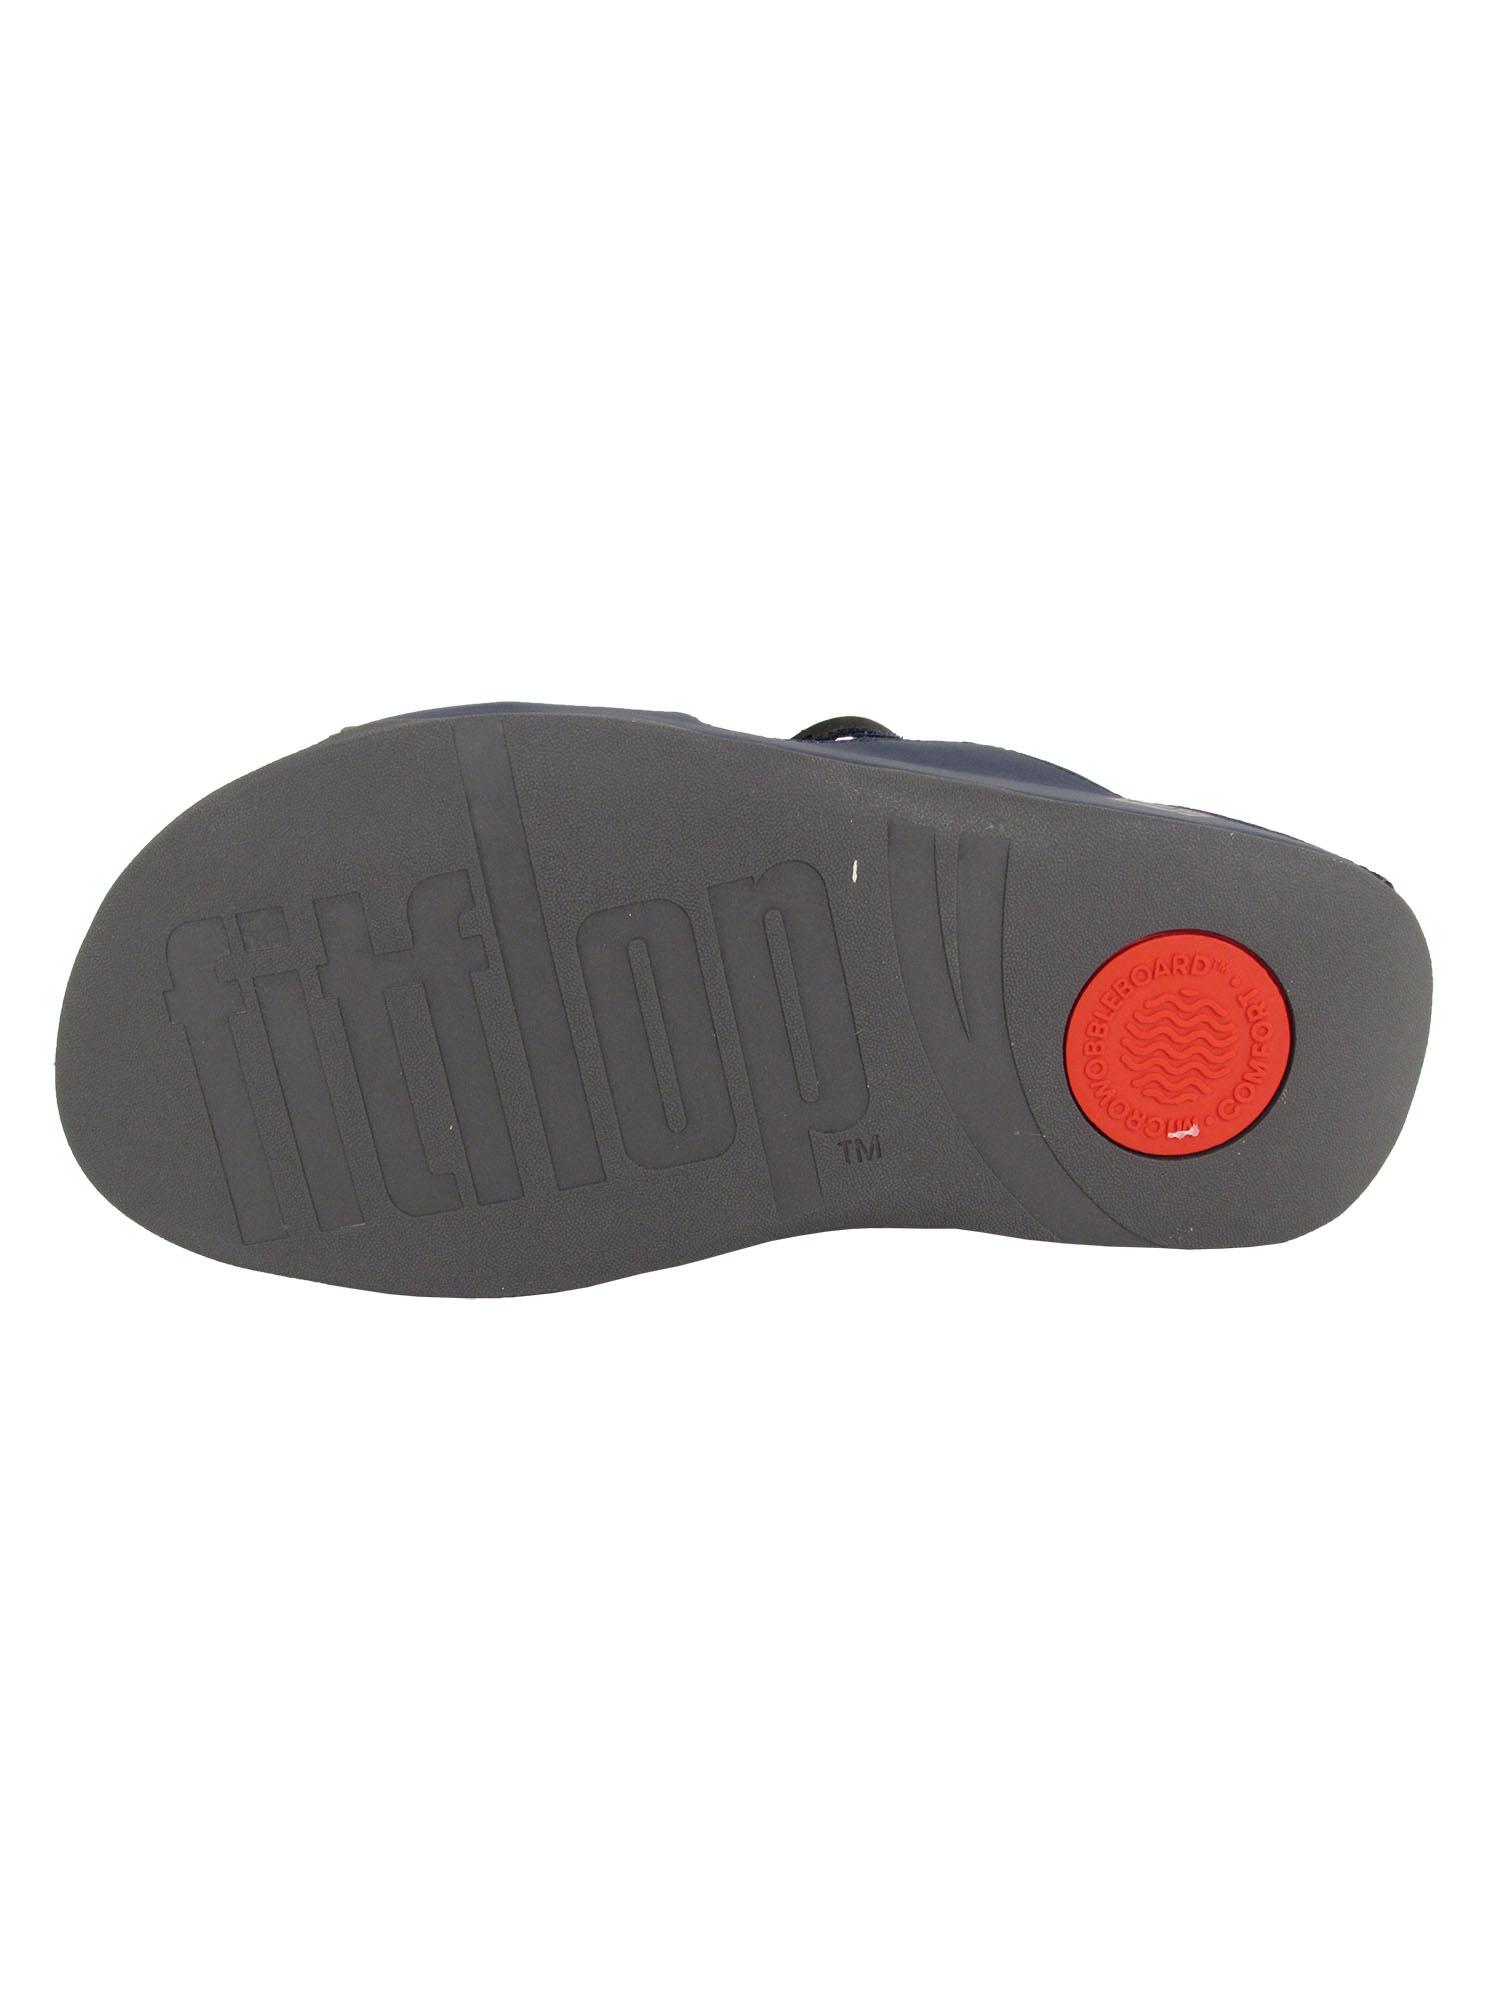 Fitflop-Mens-Sling-II-Webbing-Slide-Sandals thumbnail 9